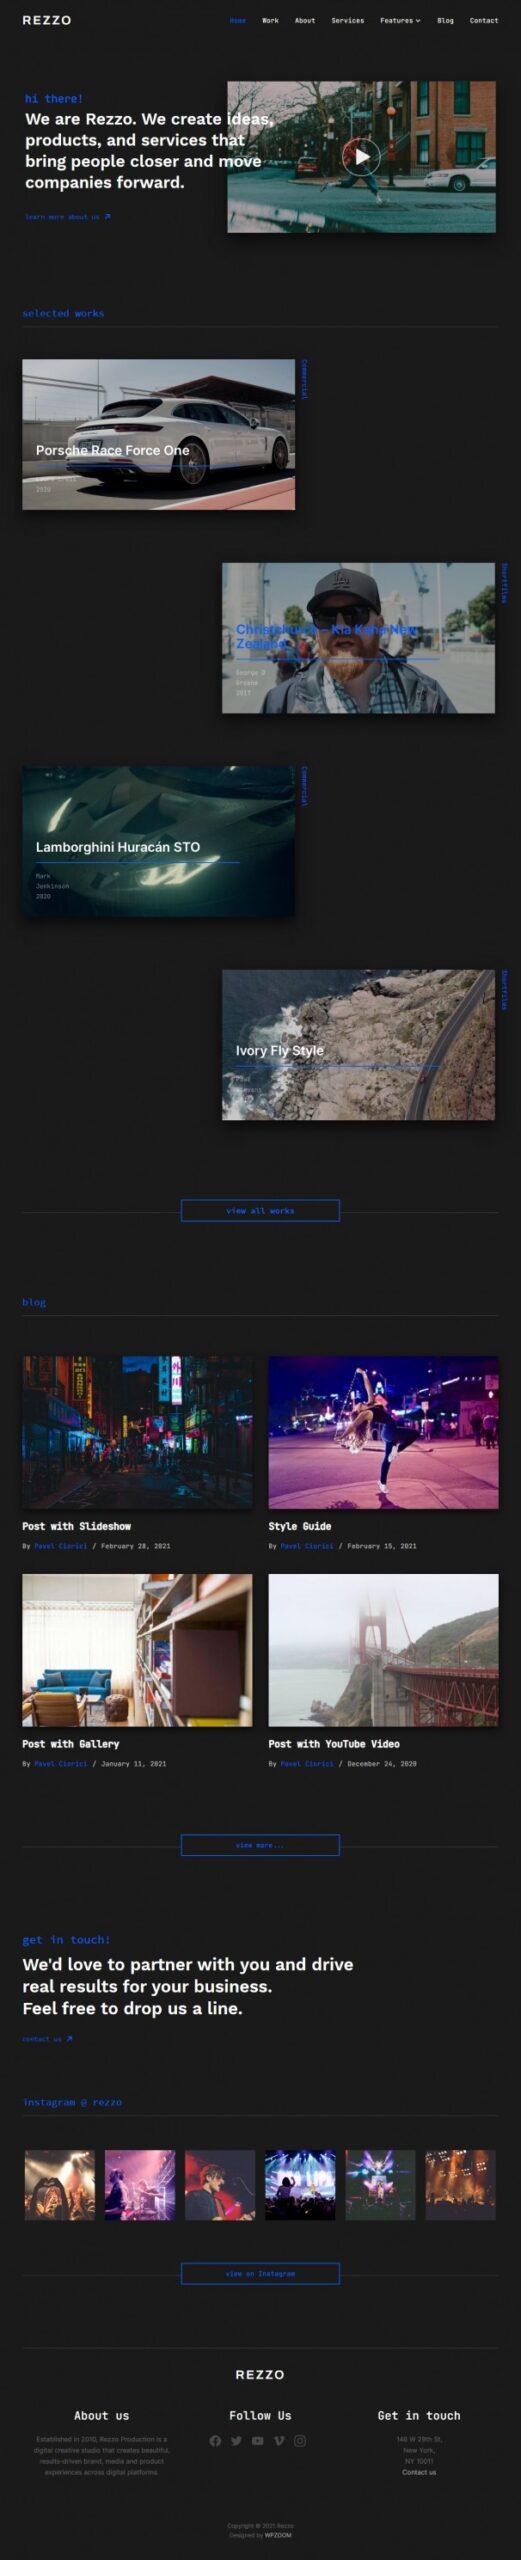 Rezzo - Video Portfolio WordPress Theme by WPZOOM